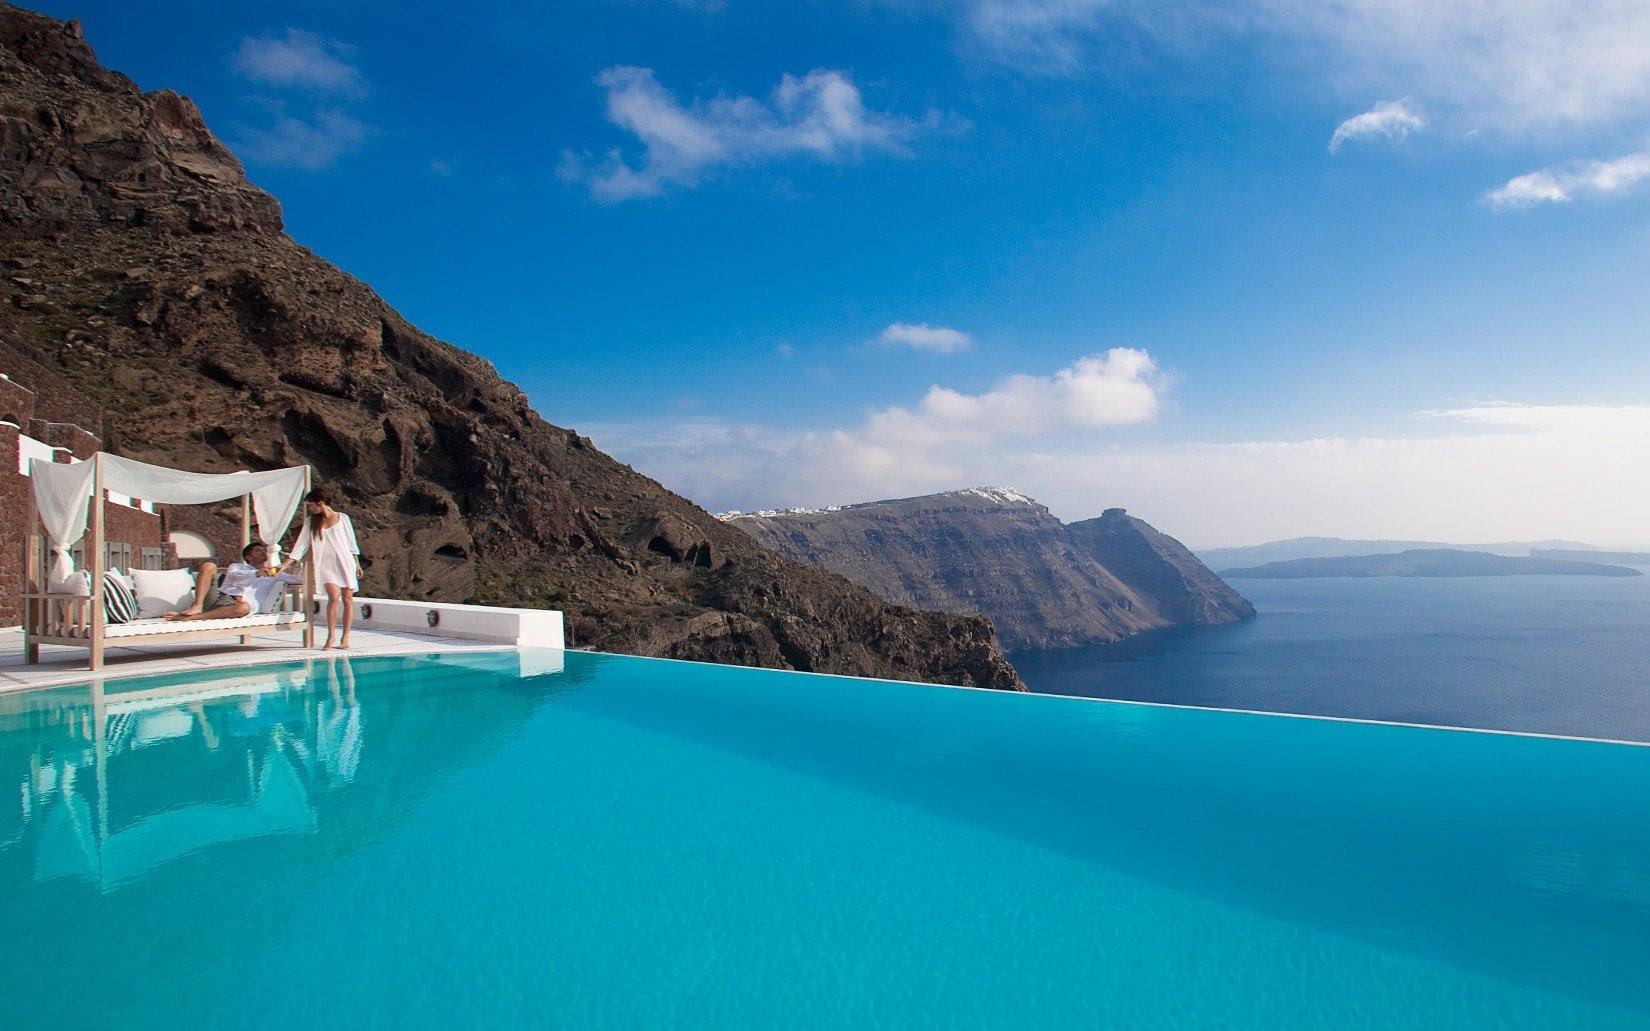 Amazing sea view and infinity pool at the San Antonio luxury 5 star Hotel in Imerovigli, Santorini